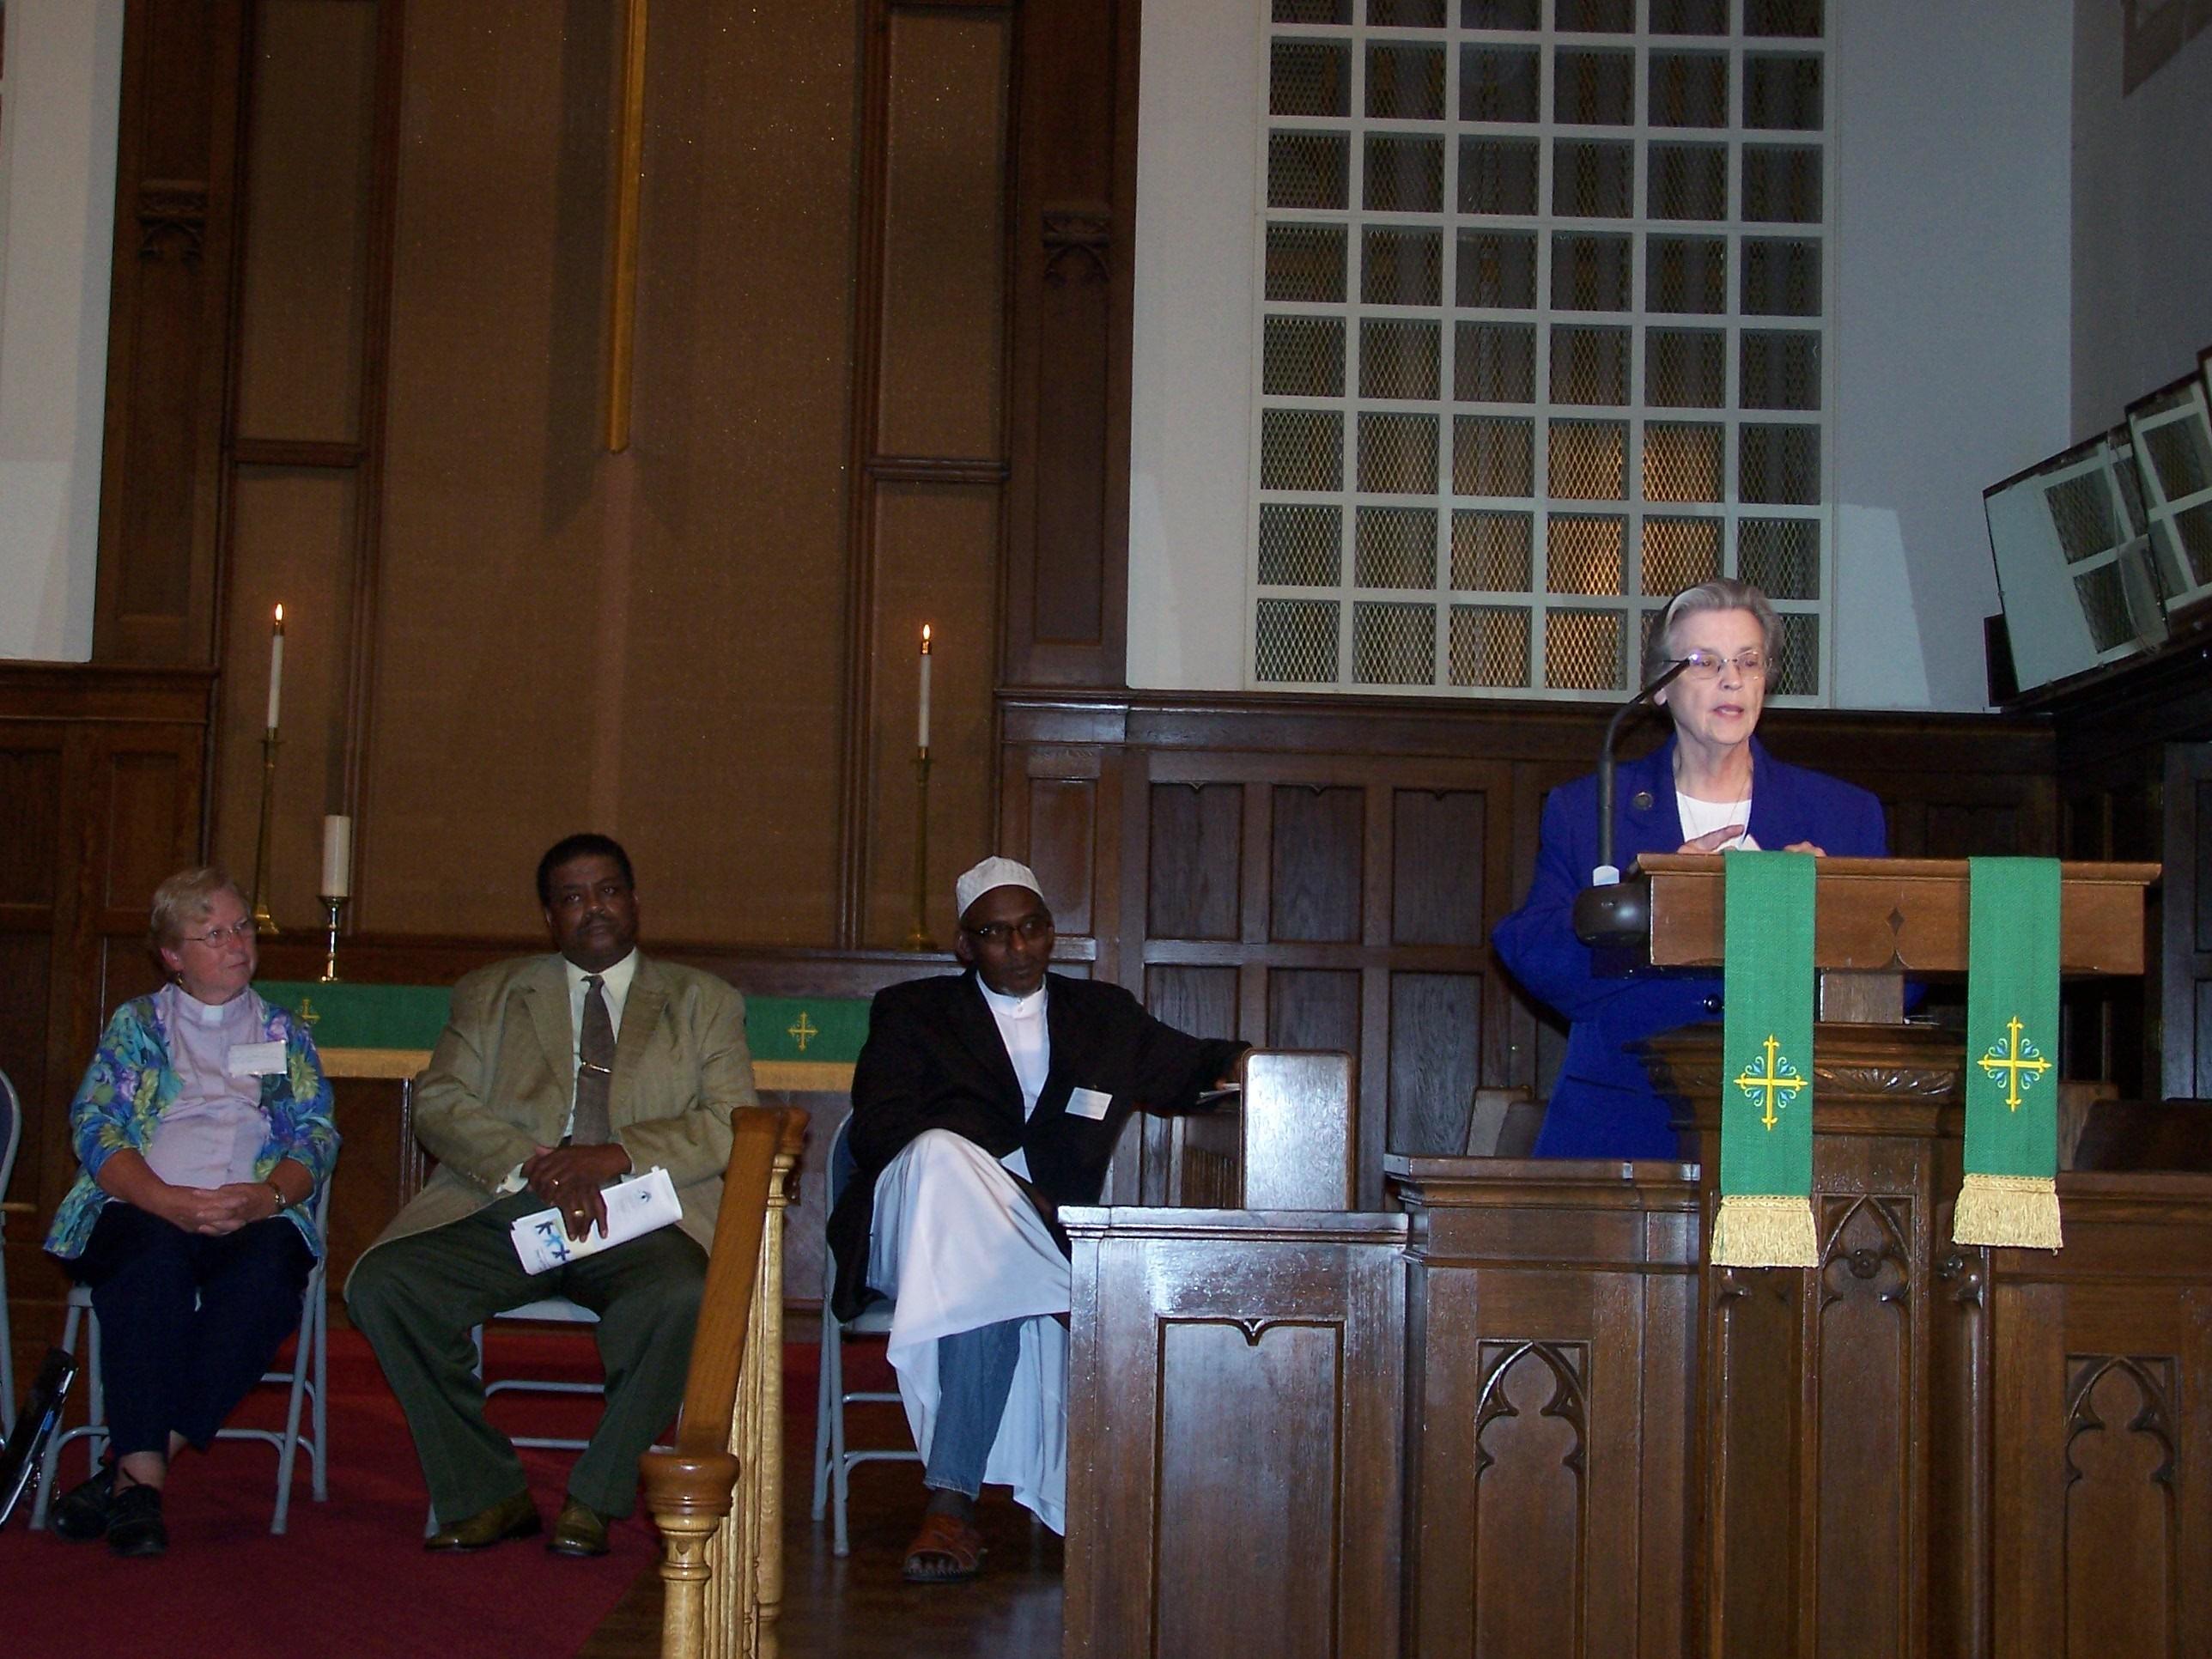 cbc6a03c1d52e0752c7c_Day_of_Prayer_Panel.JPG